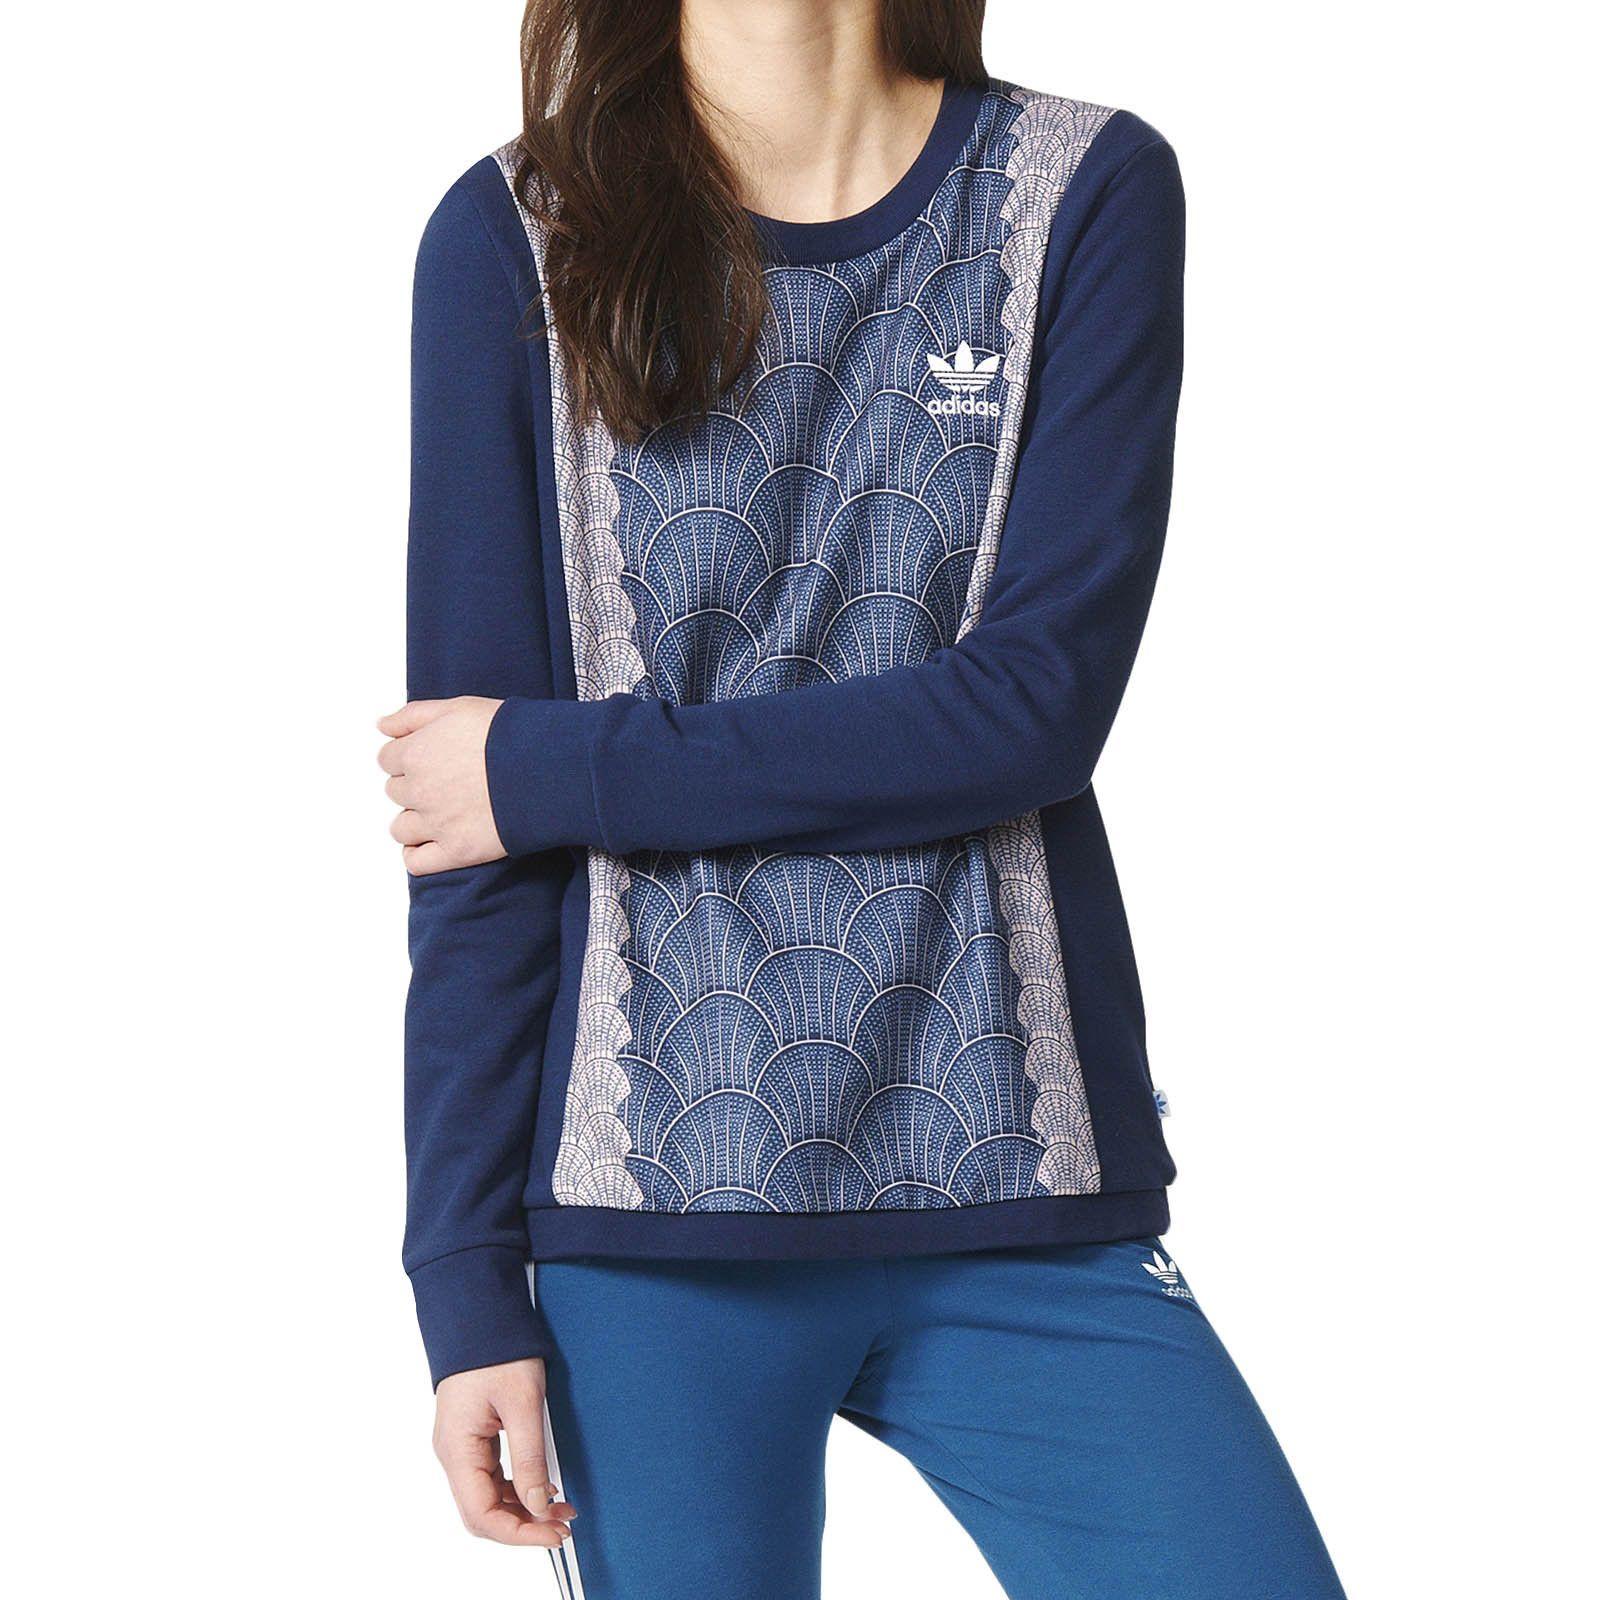 Adidas originals womens shell crew neck sweatshirt sweater jumper